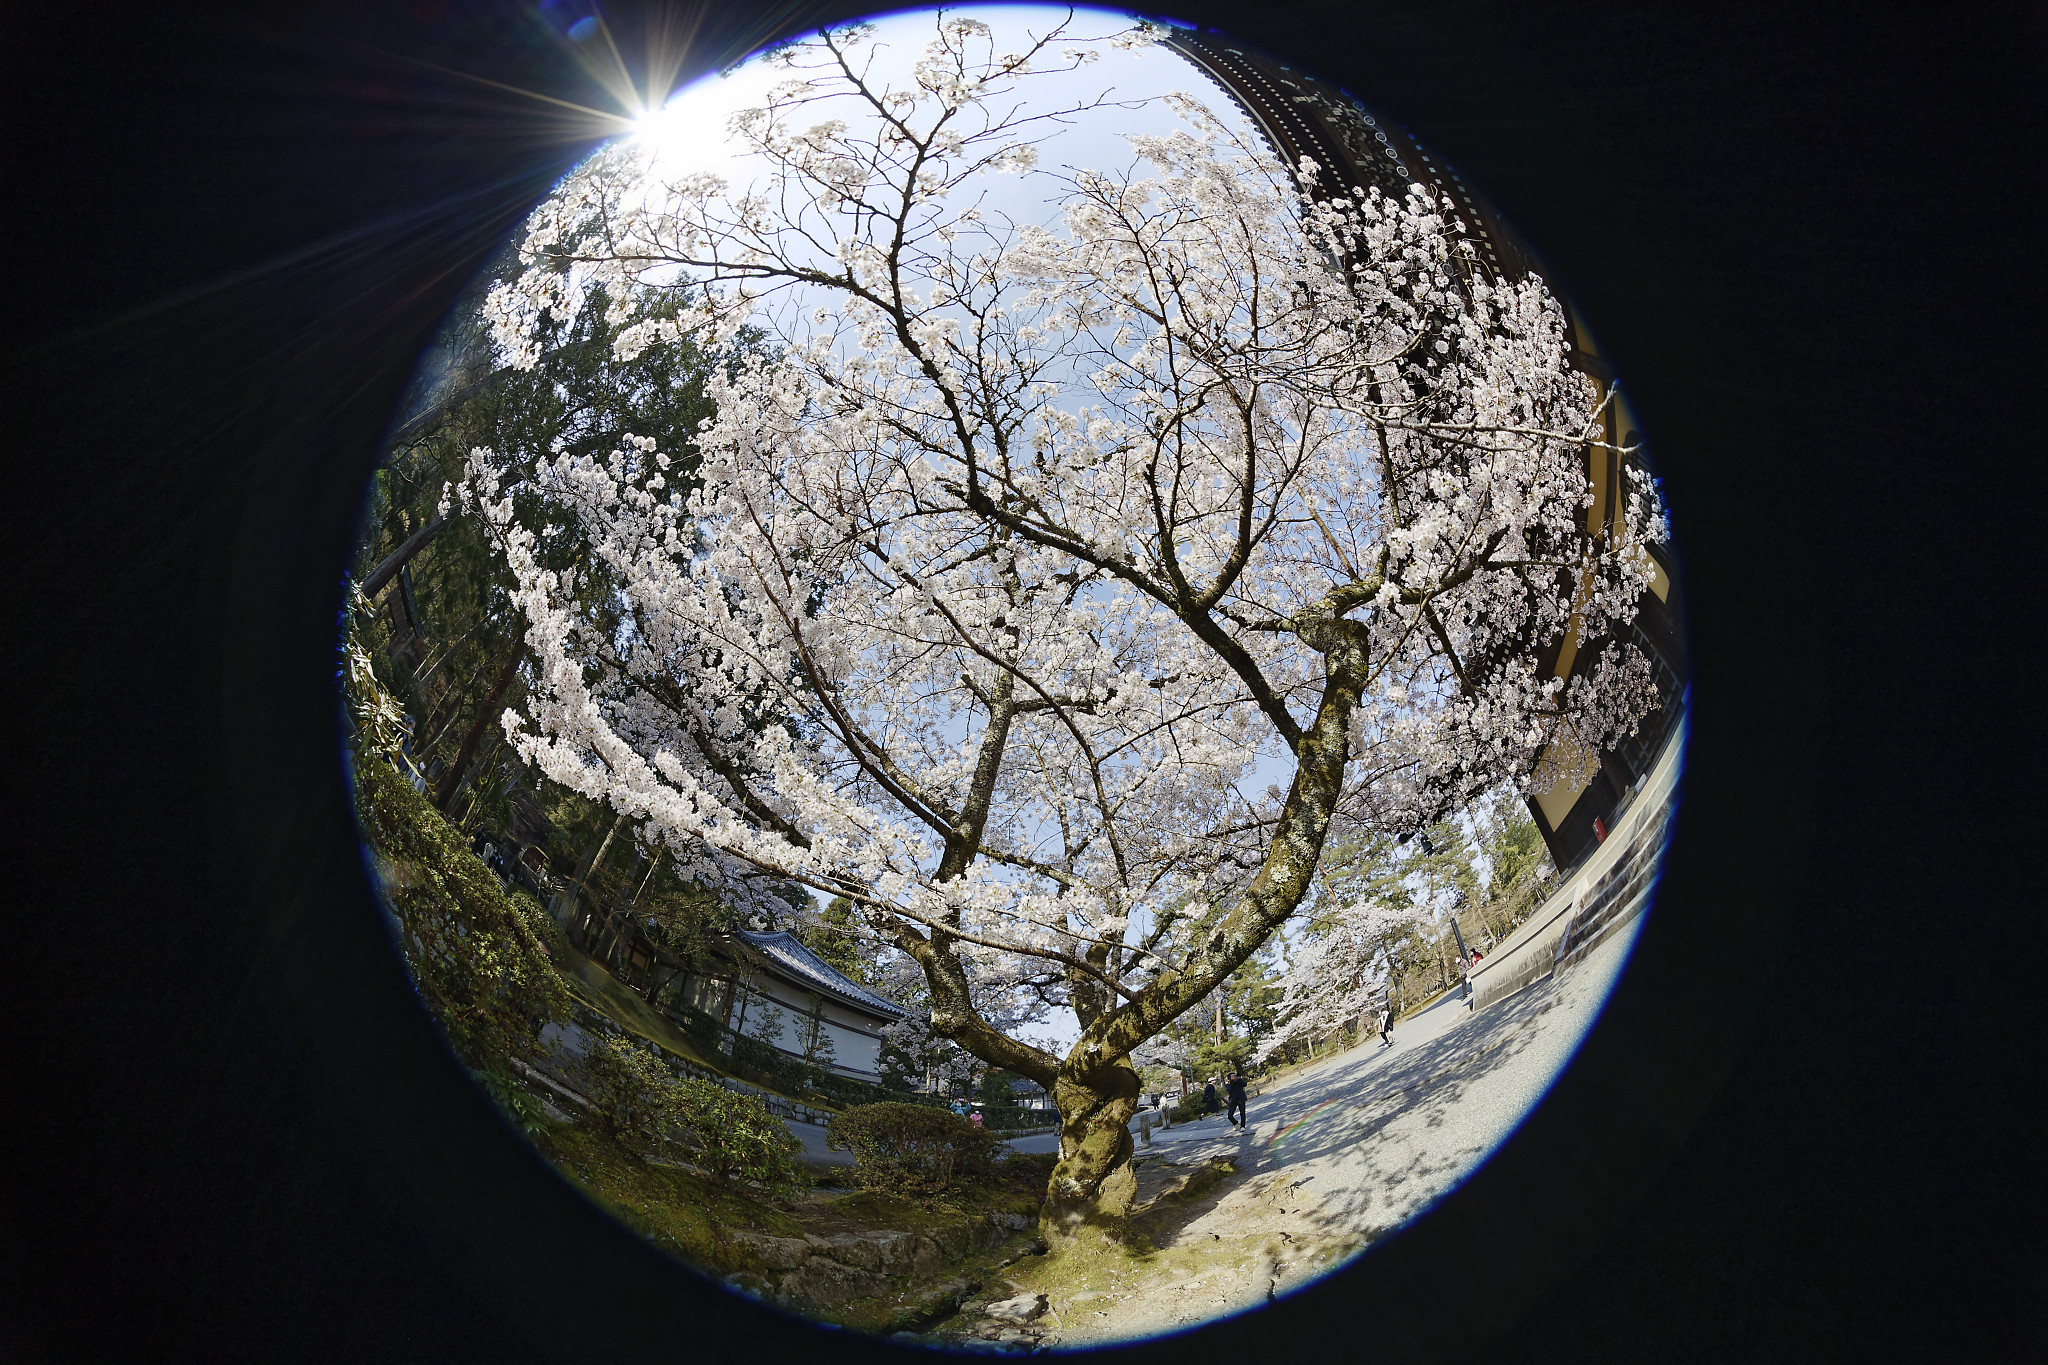 EF8-15mm f/4L FISHEYE USMの作例写真 京都 南禅寺の桜